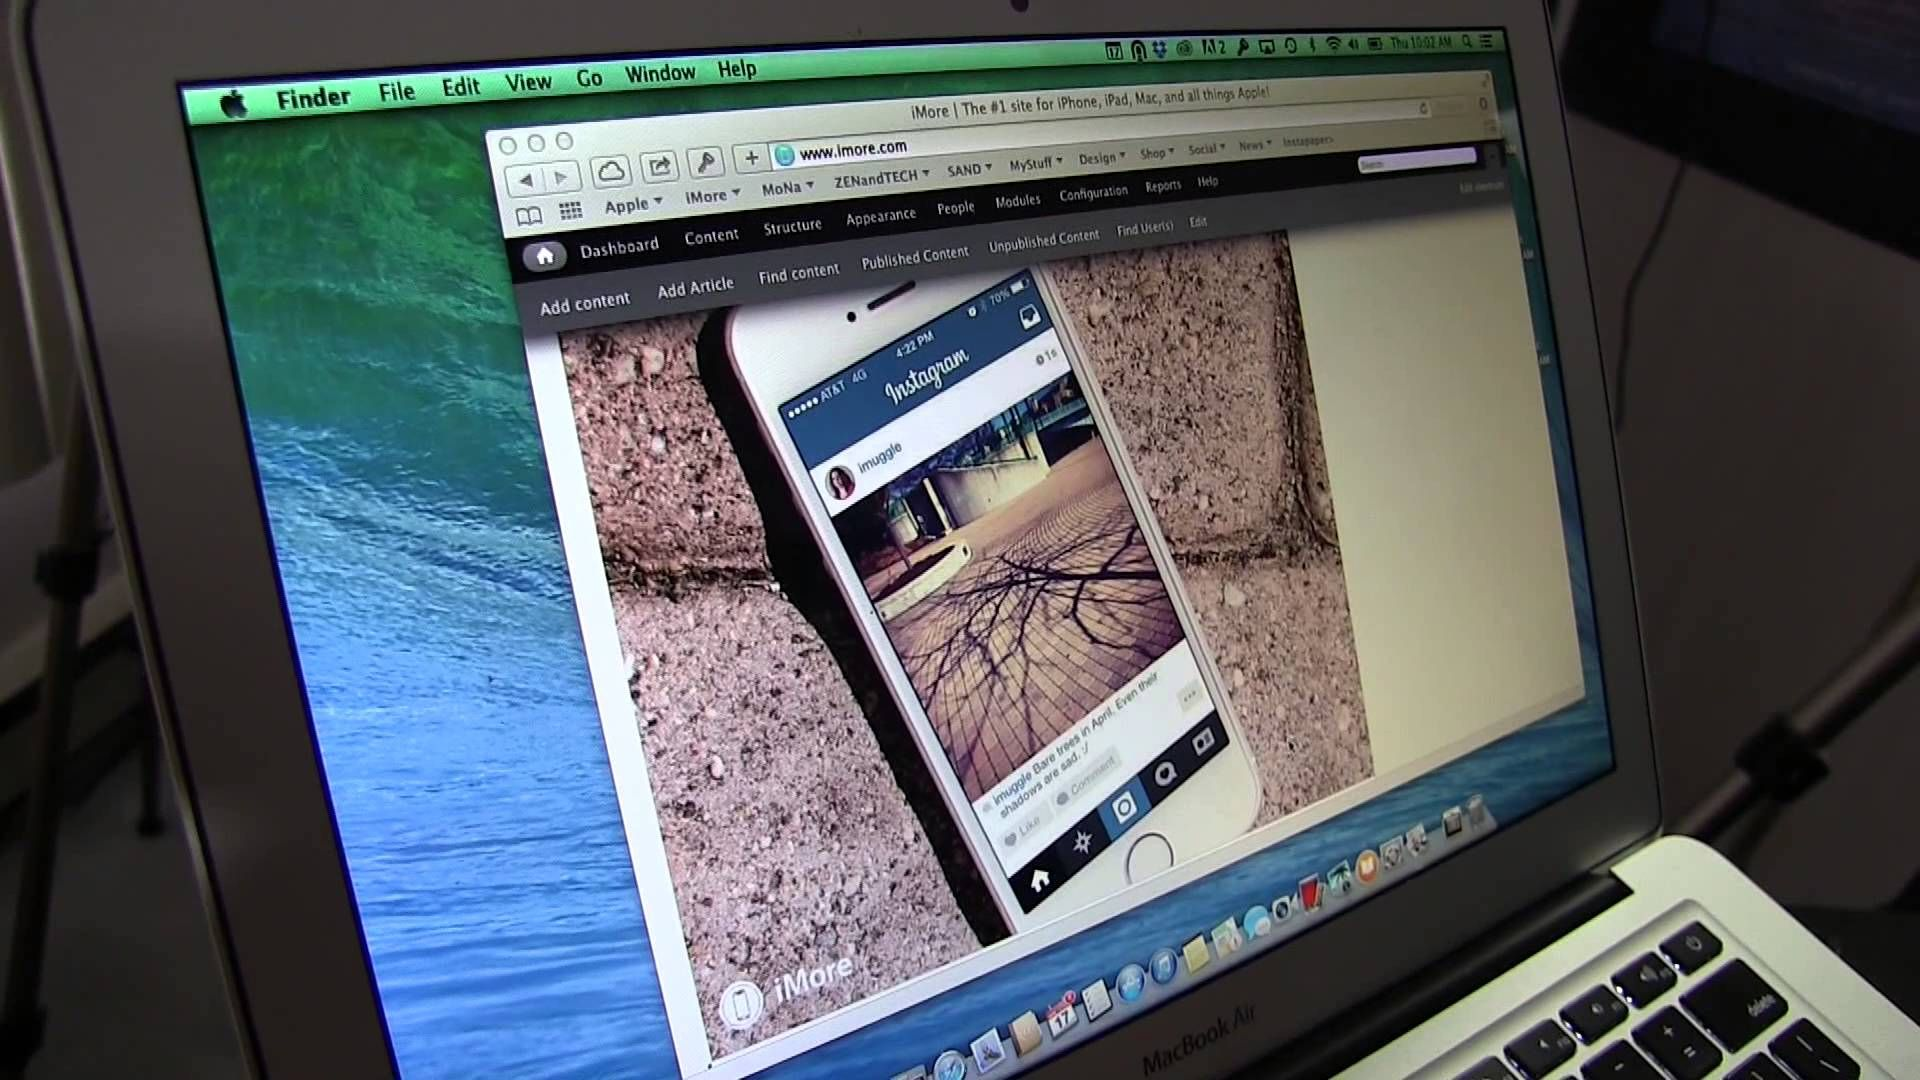 How to take a screenshot with your Mac Mac os, Take a